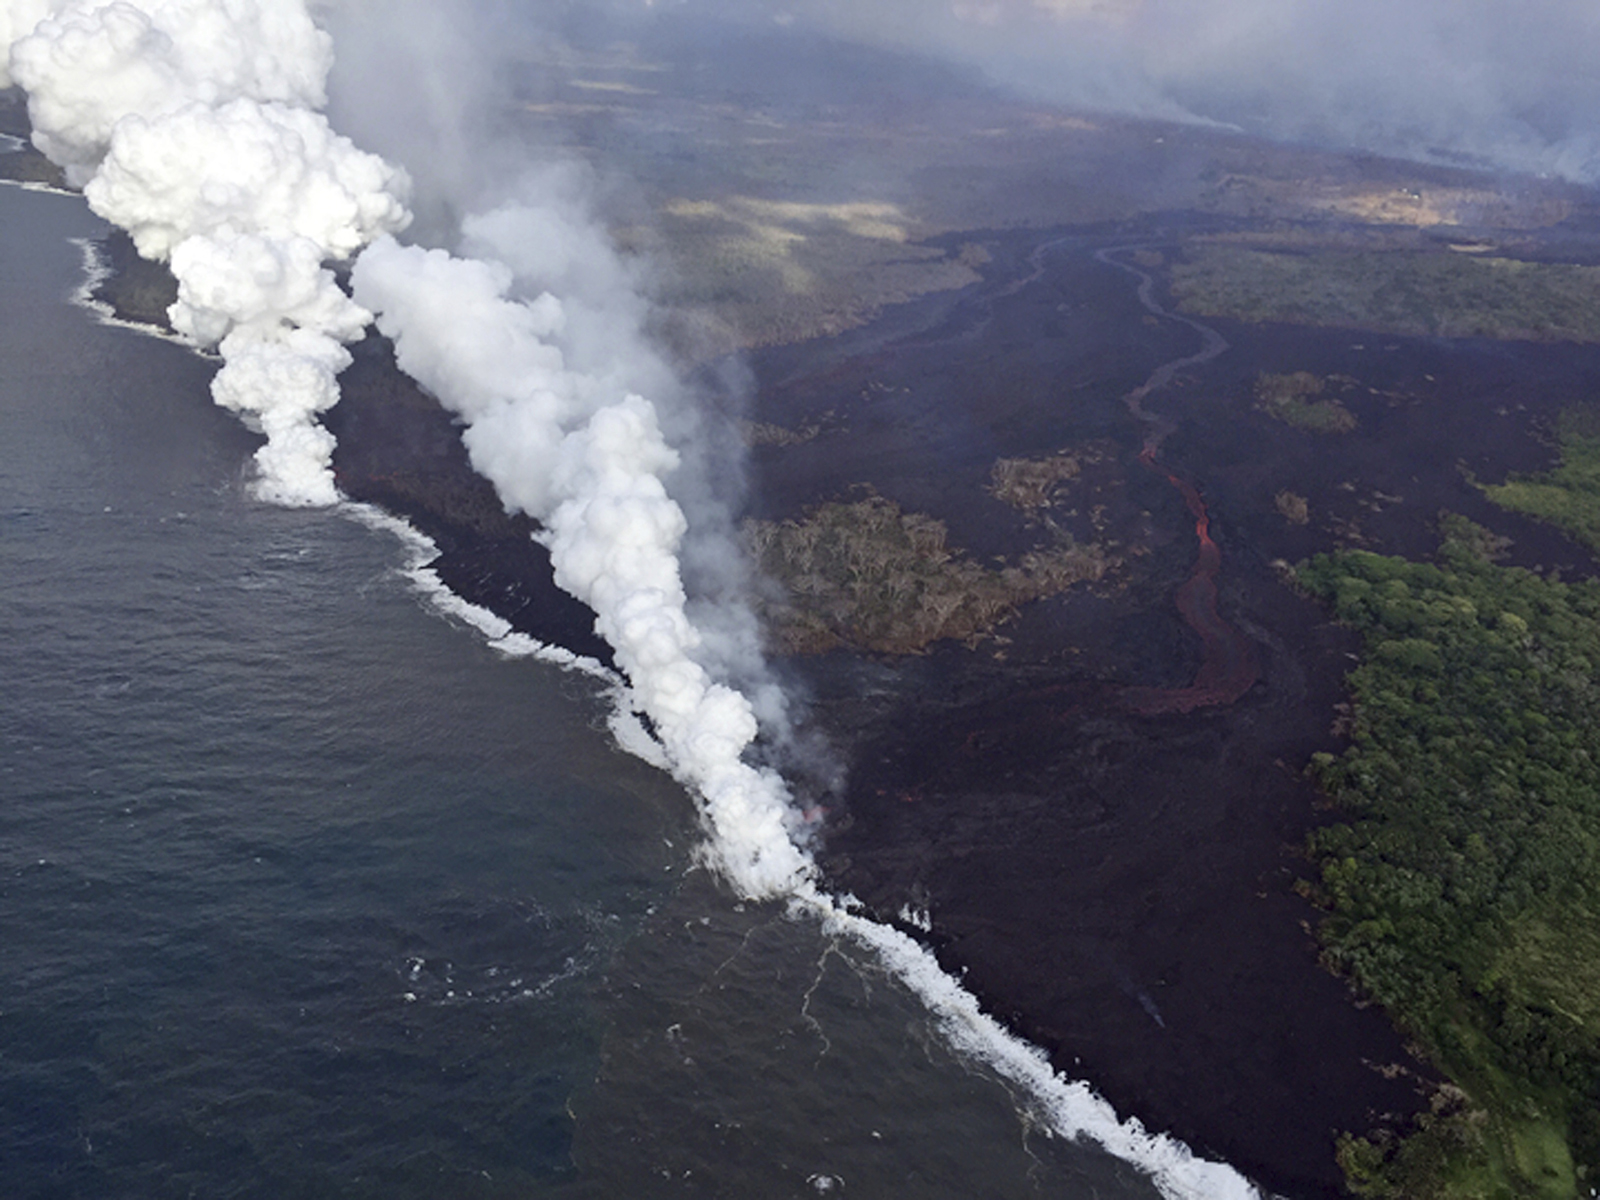 https://qz.com/wp-content/uploads/2018/05/hawaii_volcano_22.jpg?quality=80&strip=all&w=1600